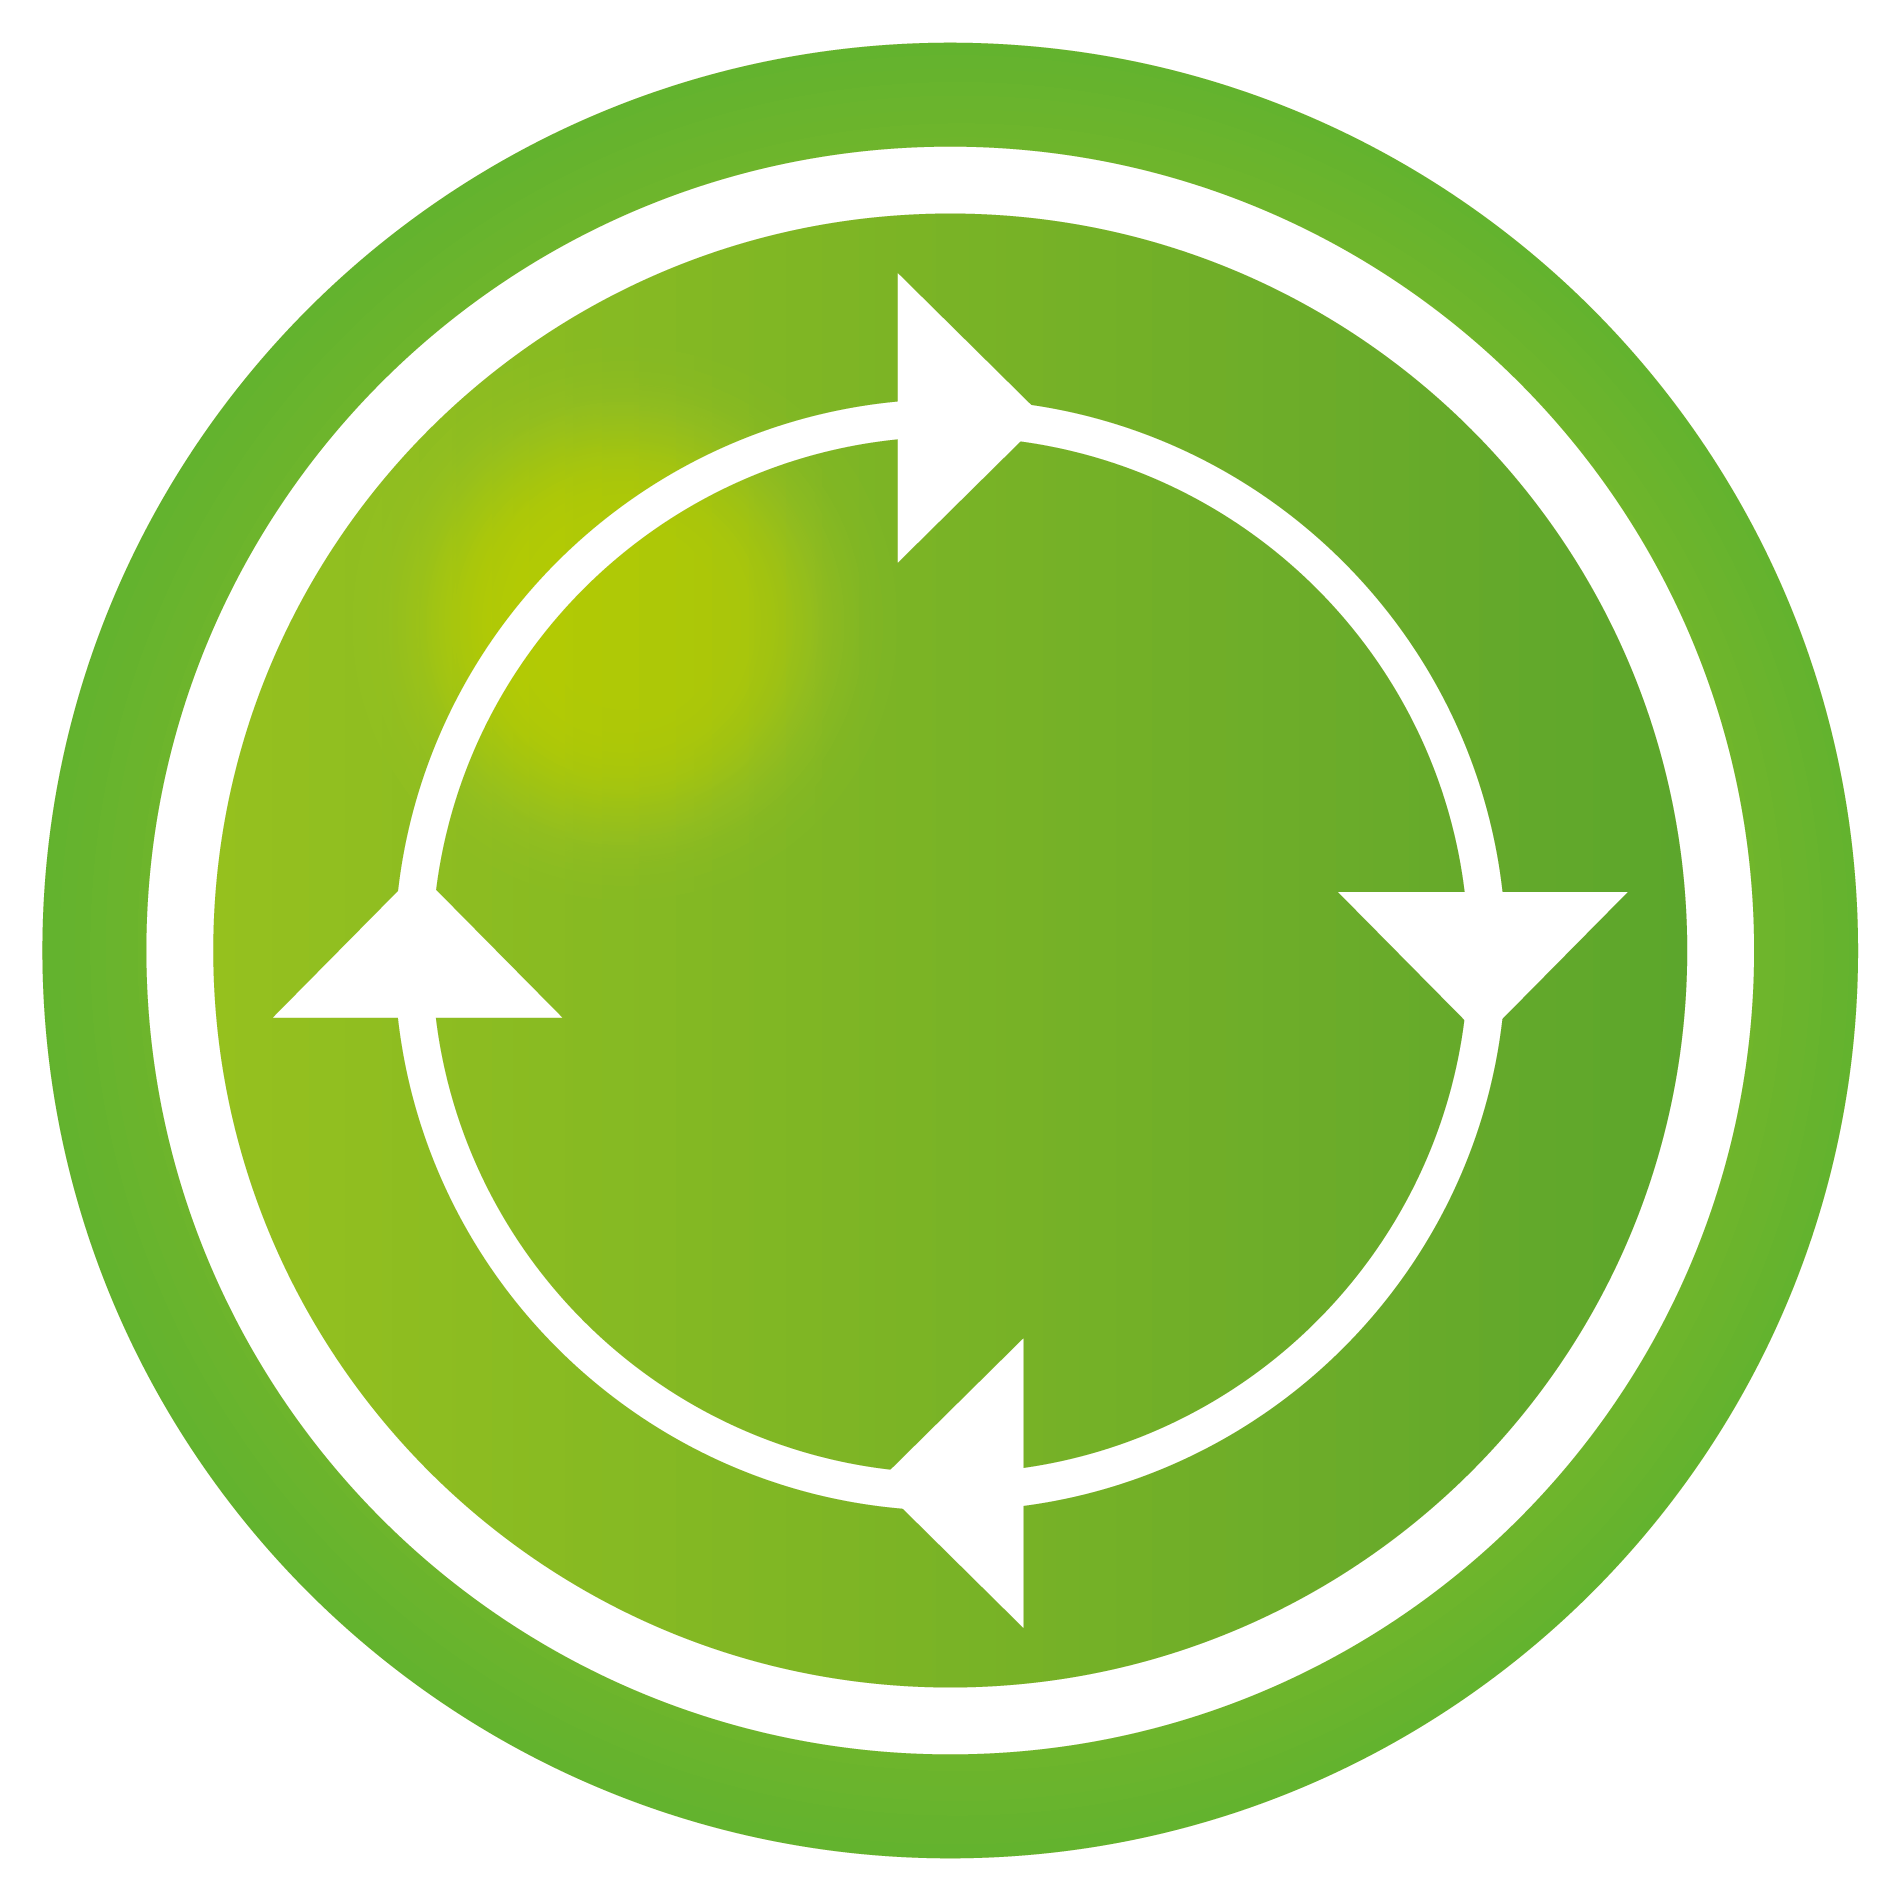 https://fordfuels.co.uk/wp-content/uploads/Renewable-Icon-350x350.png+https://fordfuels.co.uk/wp-content/uploads/Renewable-Icon-700x700.png